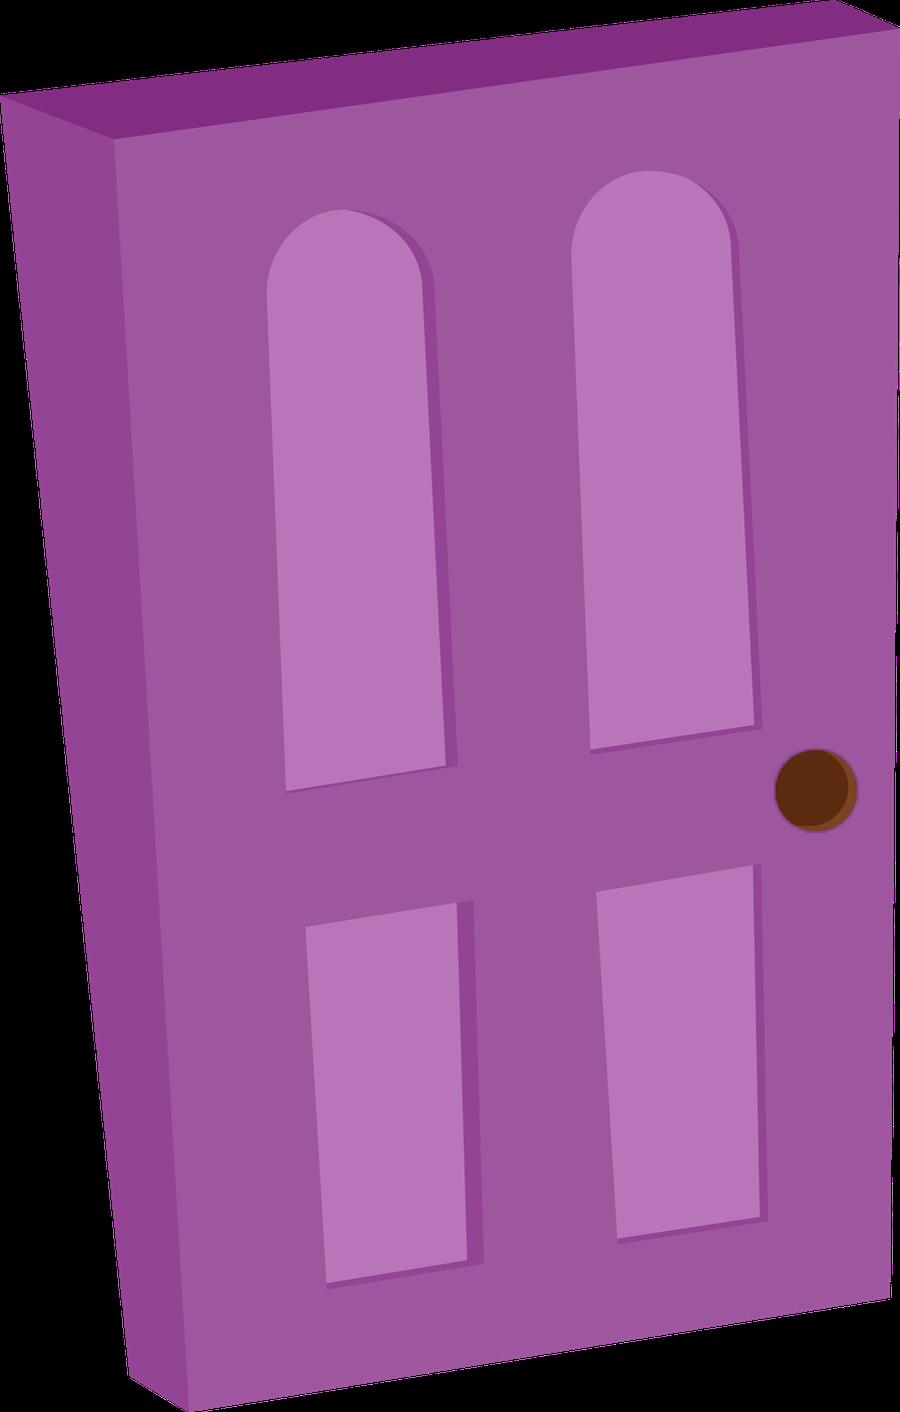 collection of door. Youtube clipart purple